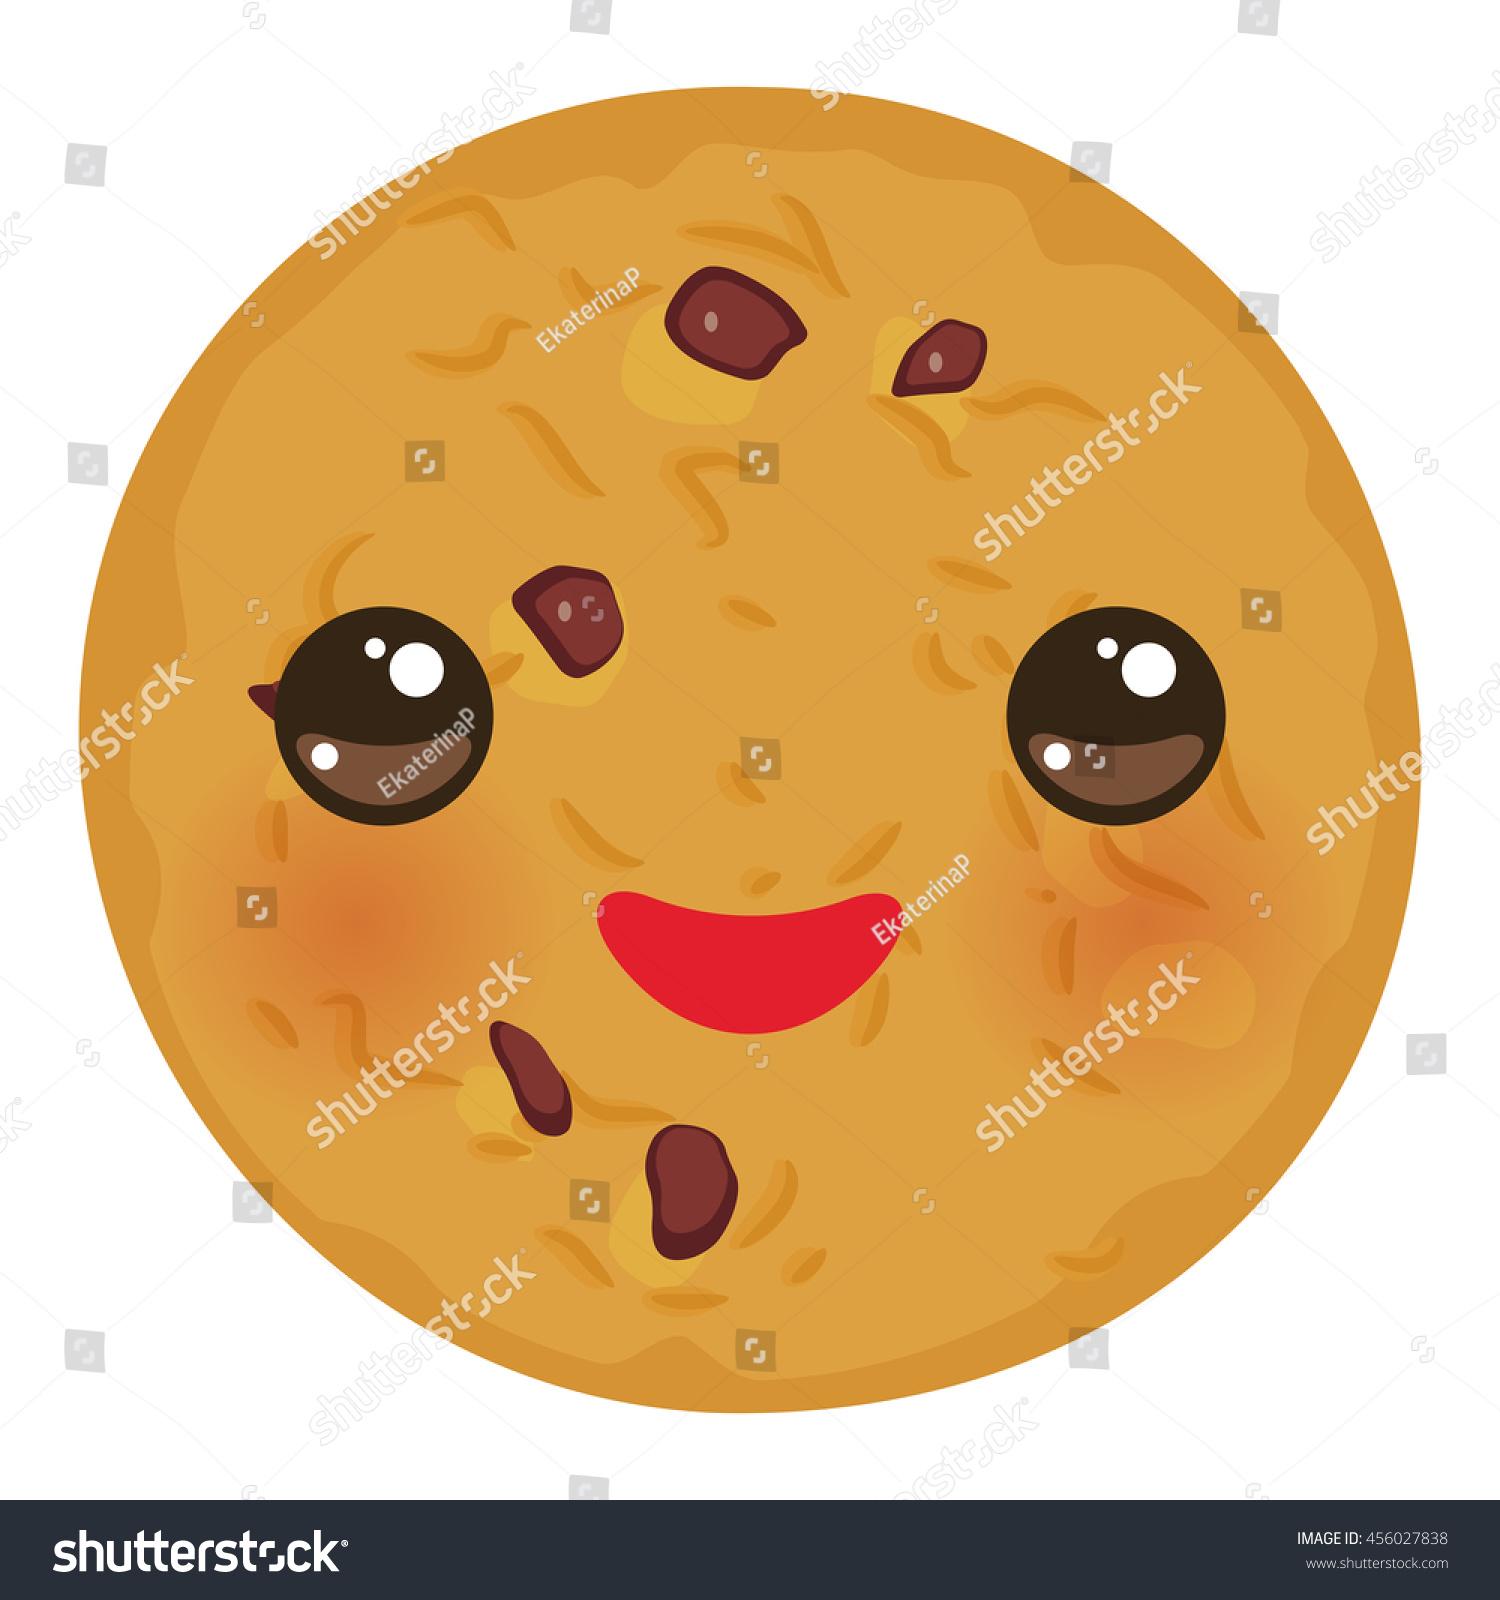 Cute cookie cartoon